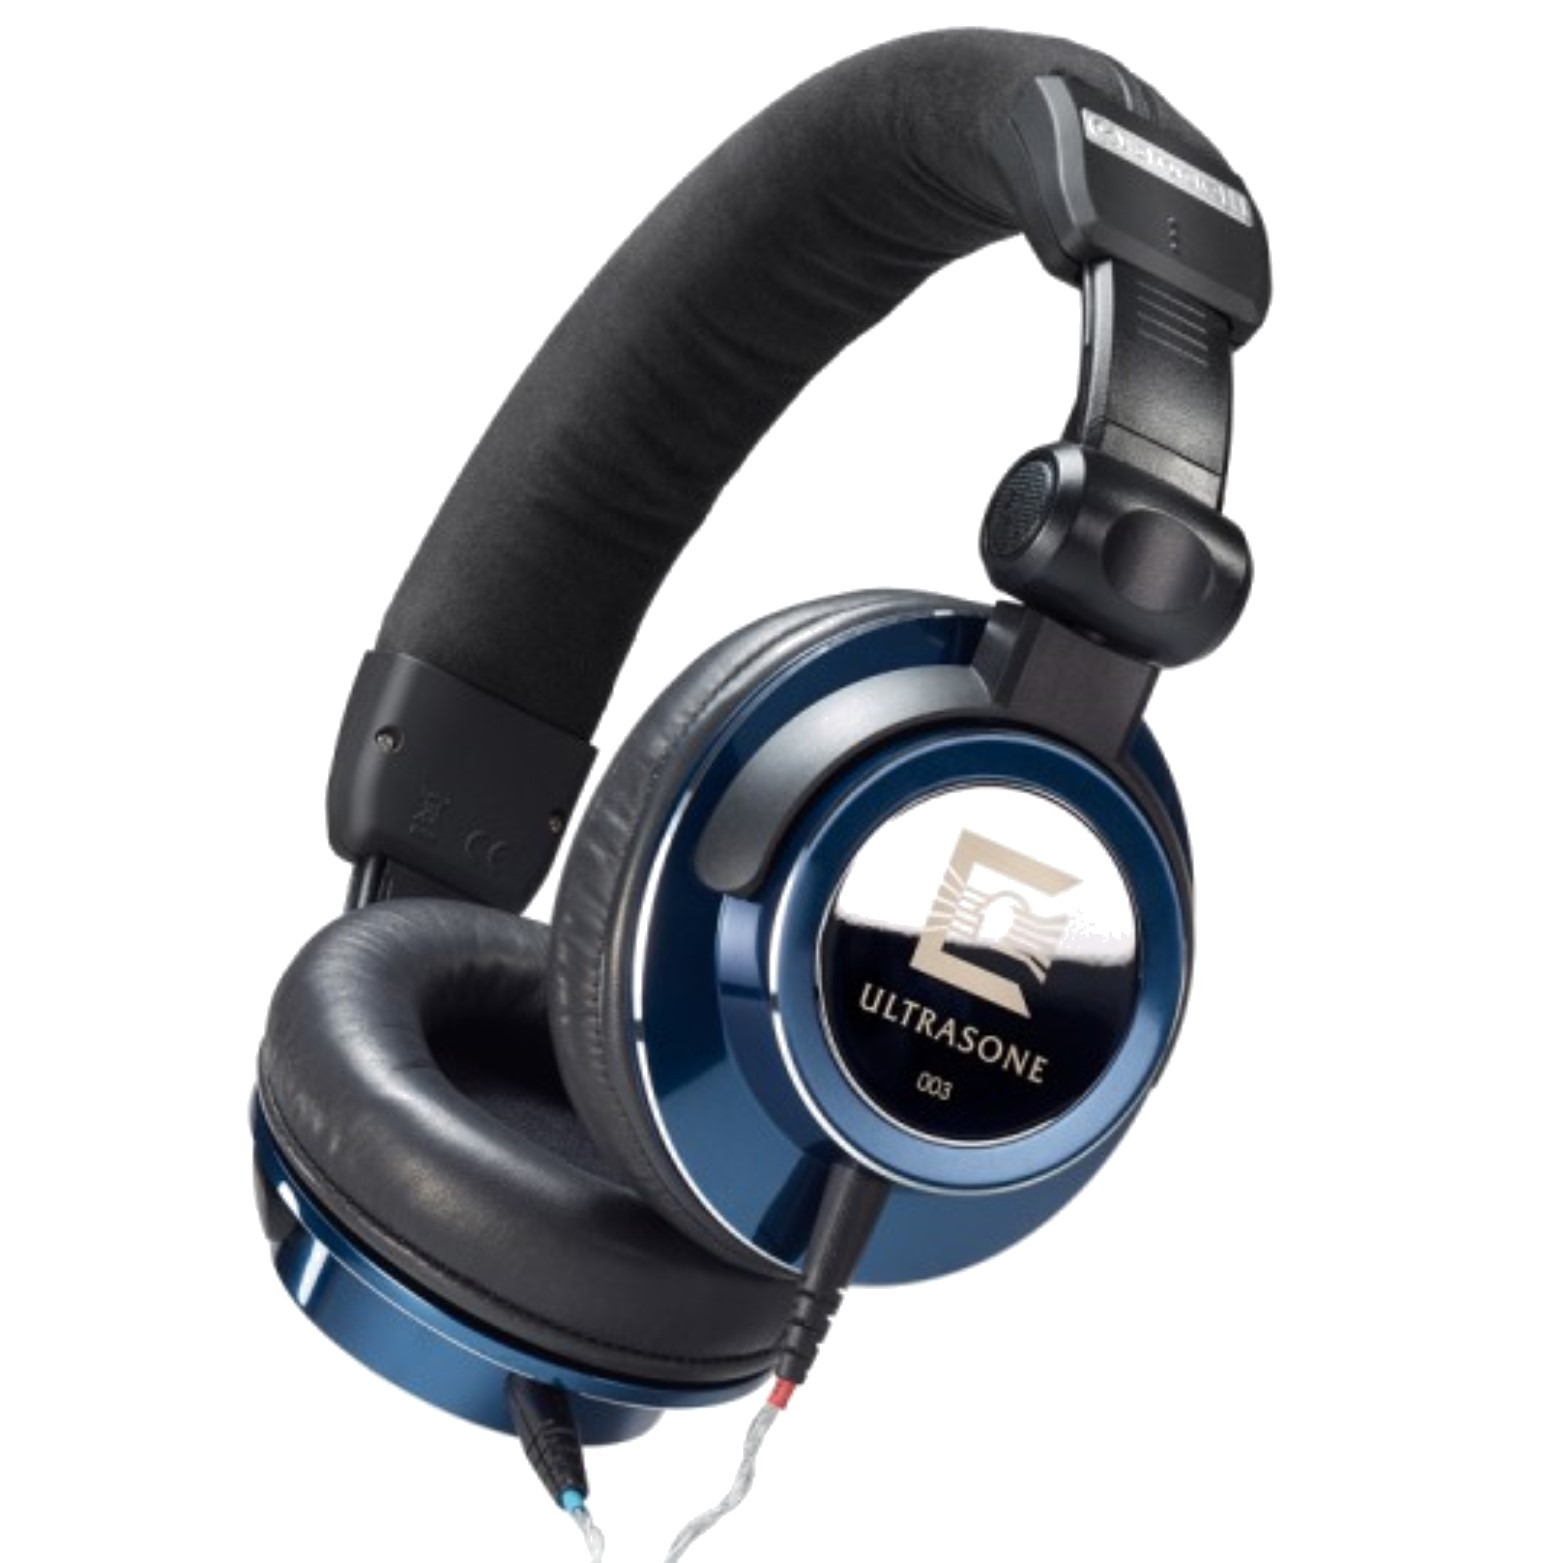 Ultrasone Tribute 7 Anniversary Series Headphone with Woo...